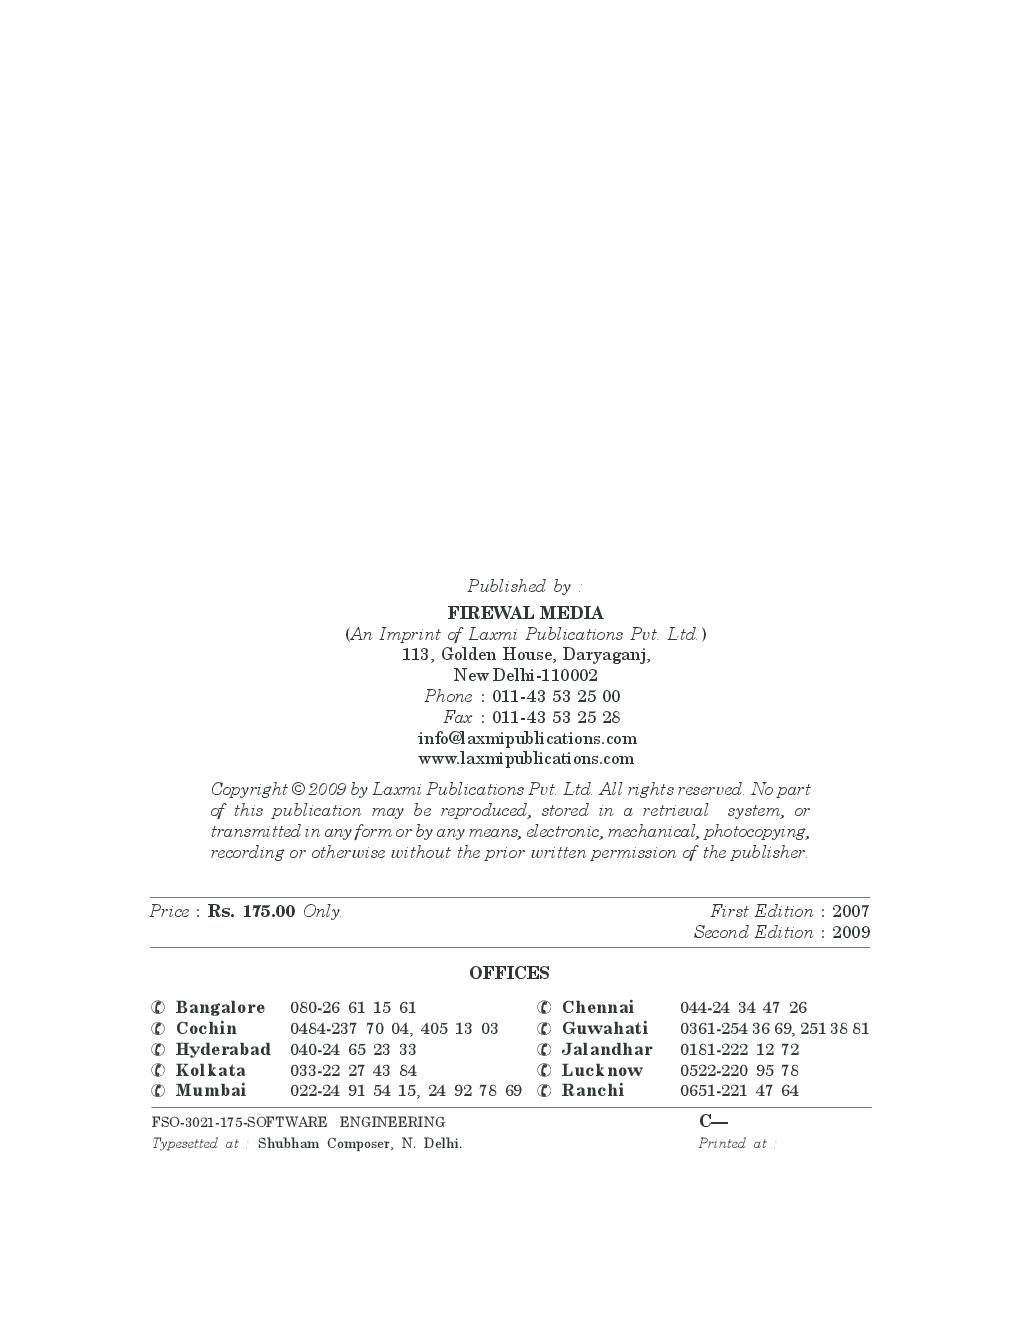 Software engineering by bharat bhushan agarwal pdf file